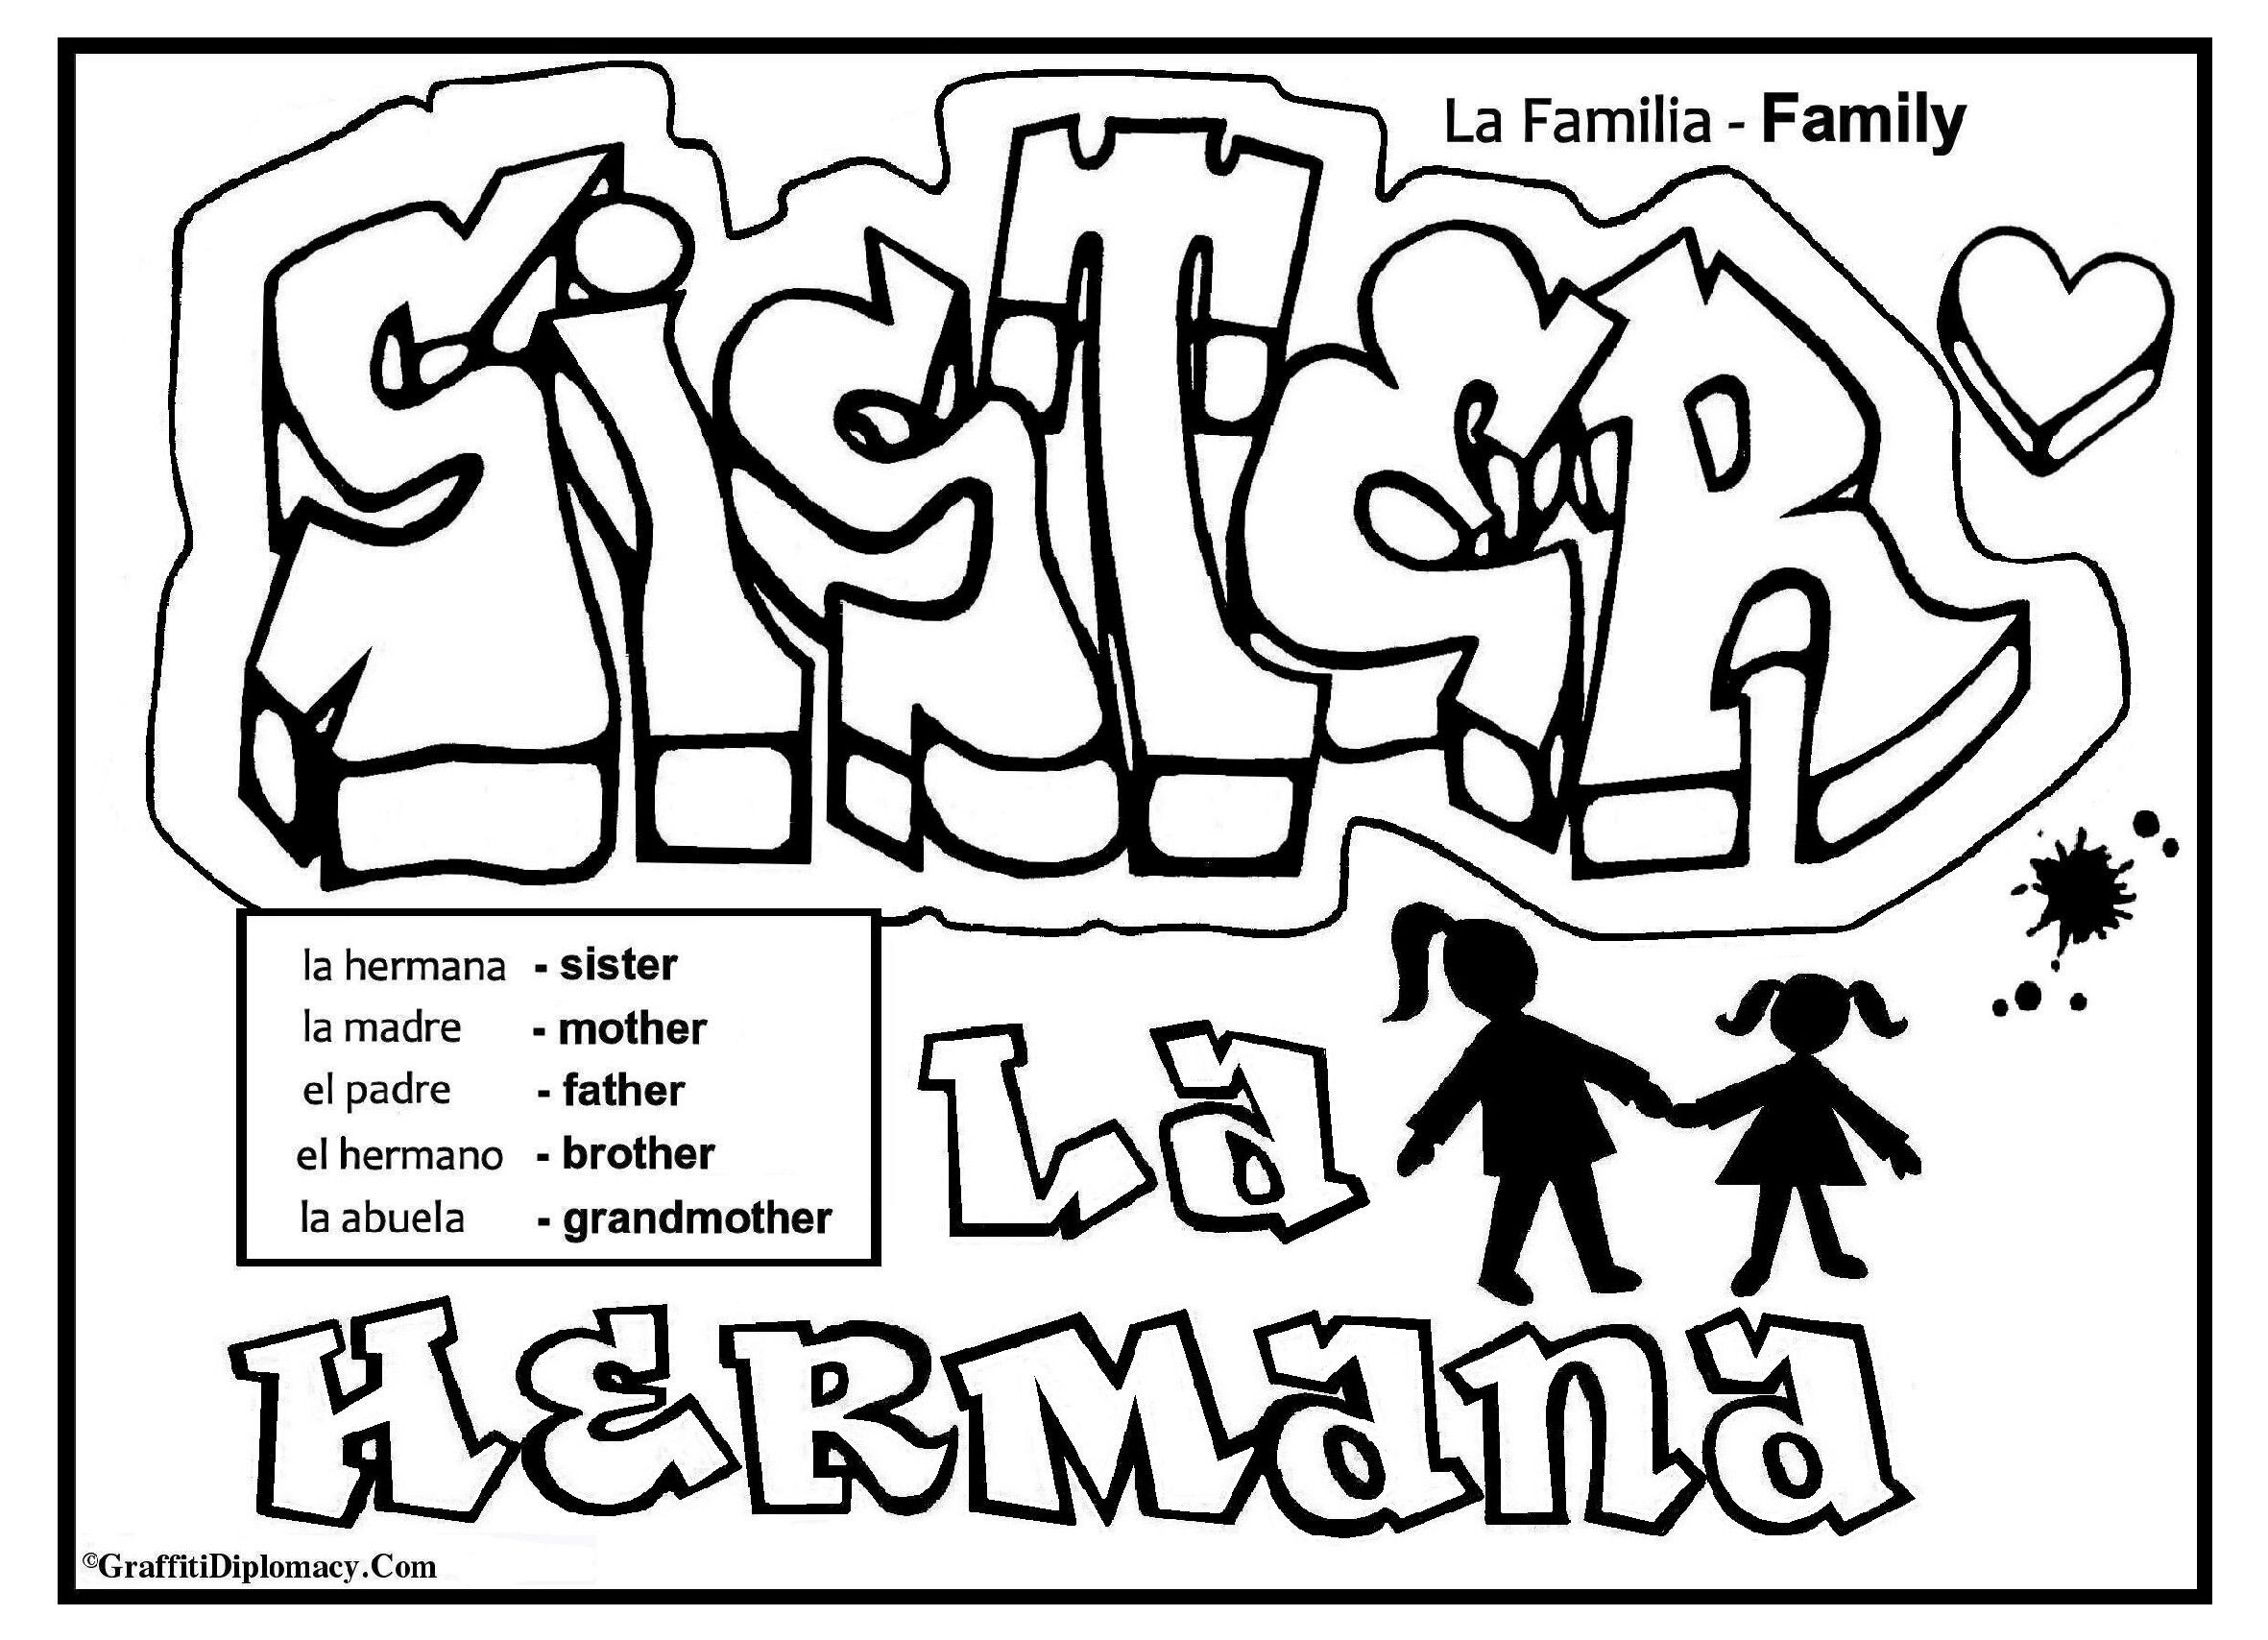 English Spanish Free Printable Graffiti Coloring Page Family La